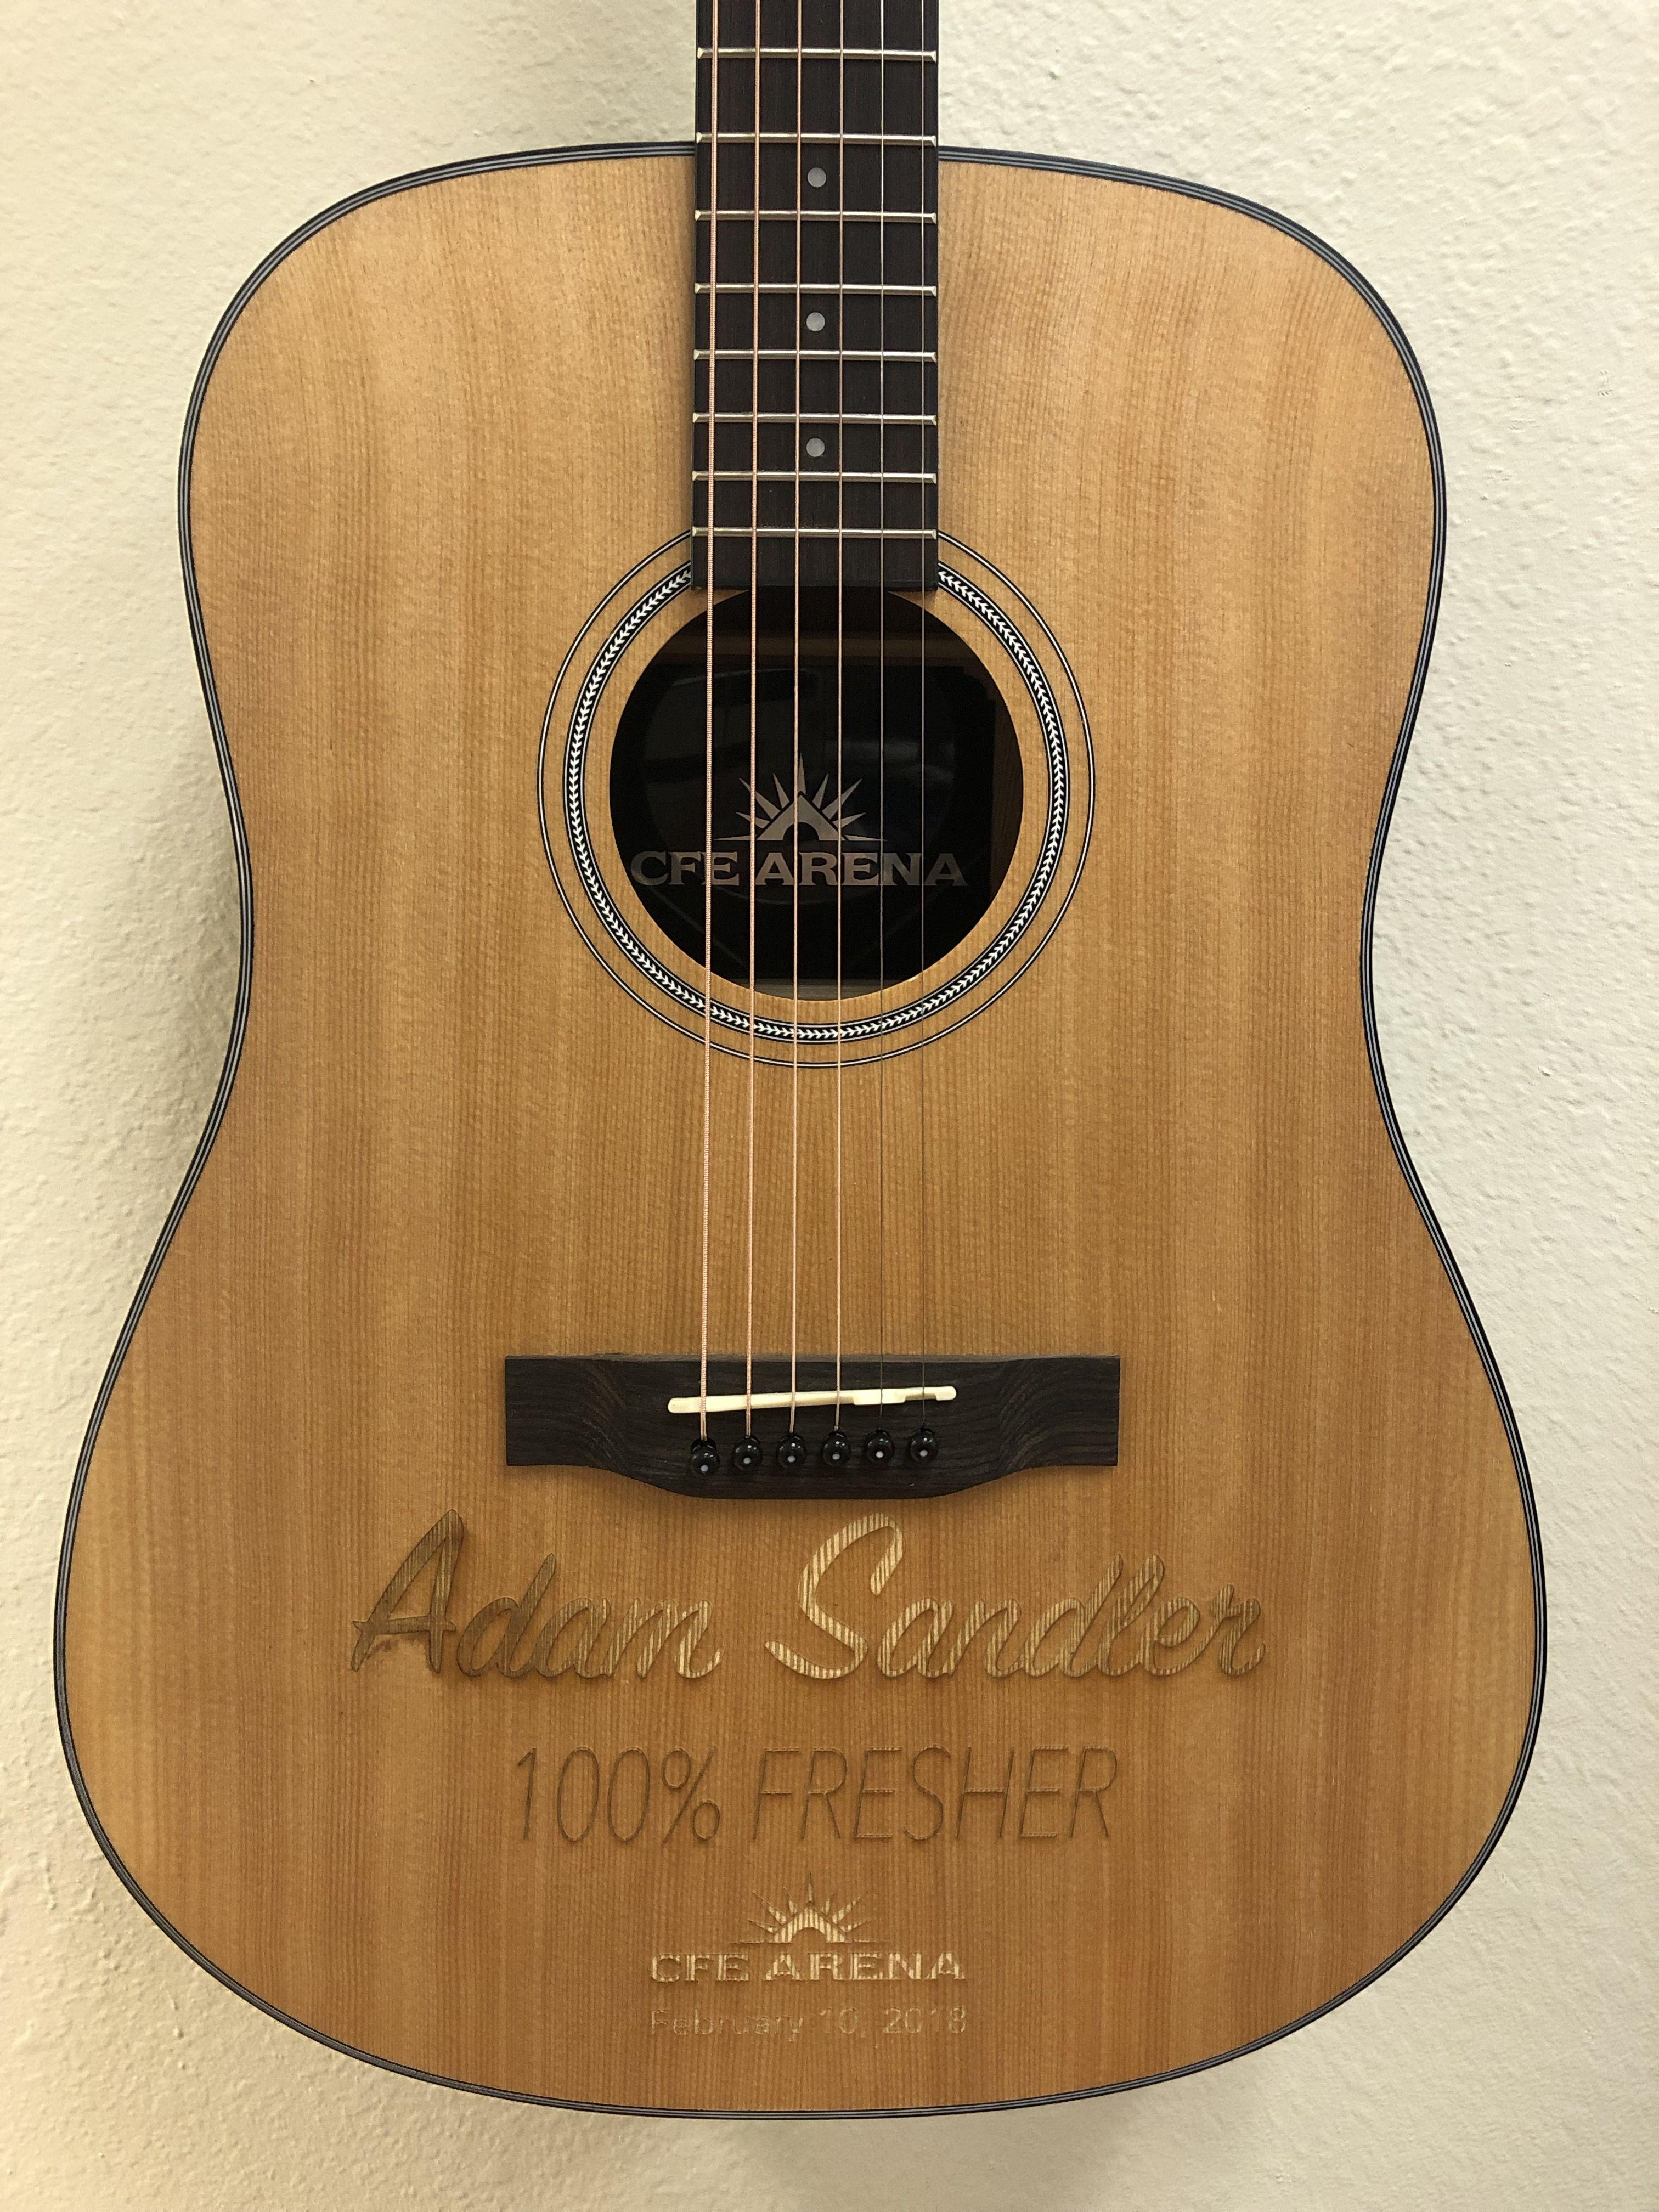 Custom Branded Engraved Acoustic Guitar For Adam Sandler By Brand O Guitar Company Guitar Acoustic Guitar Esp Guitars